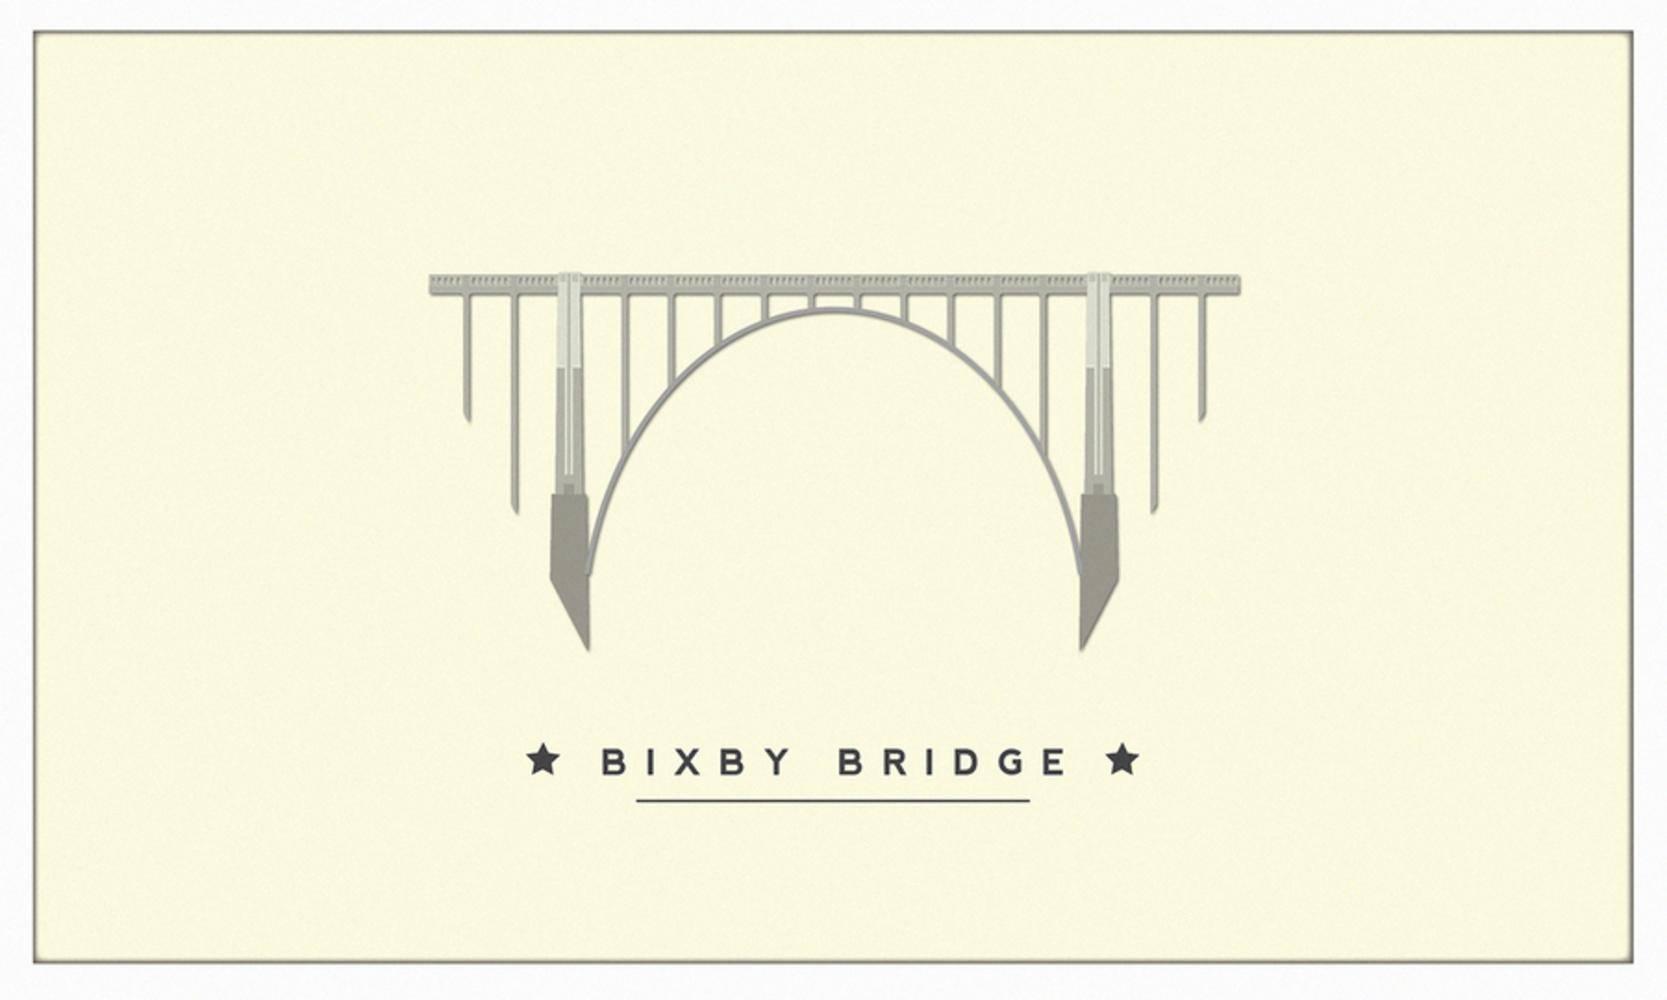 Bixby bridge sm.thumb